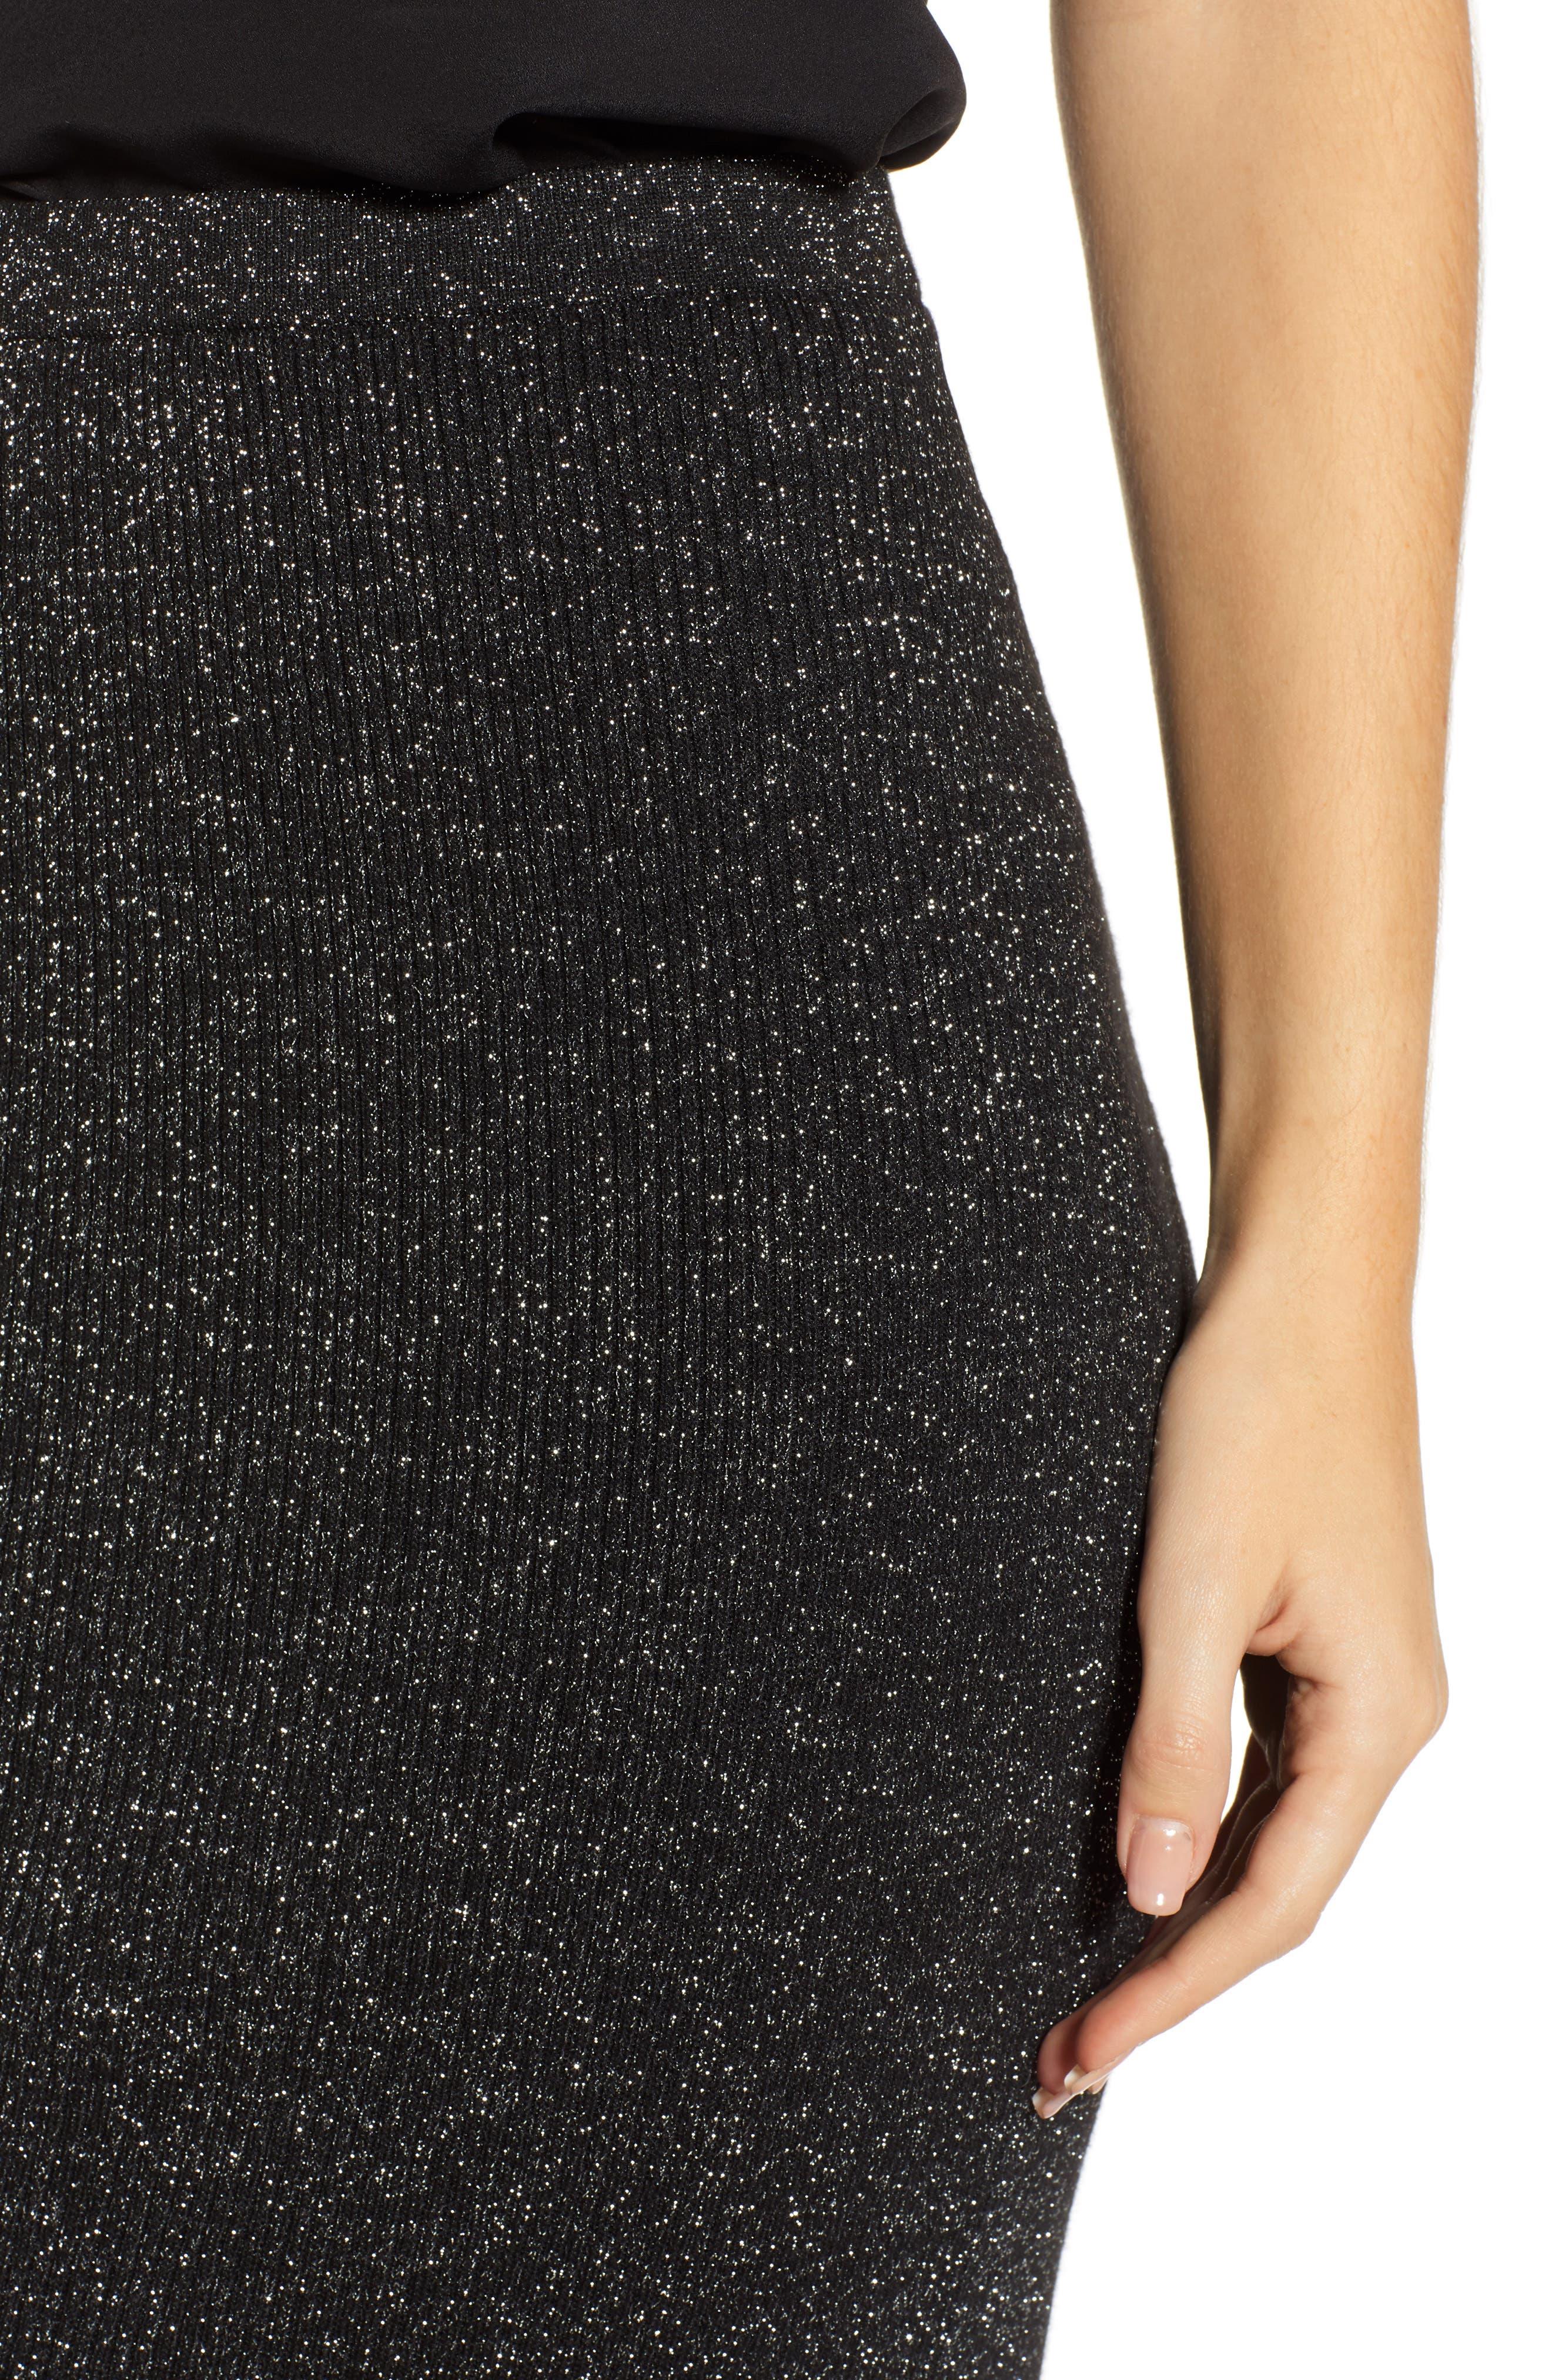 Metallic Pencil Skirt,                             Alternate thumbnail 4, color,                             BLACK- SILVER SPANGLE METALLIC